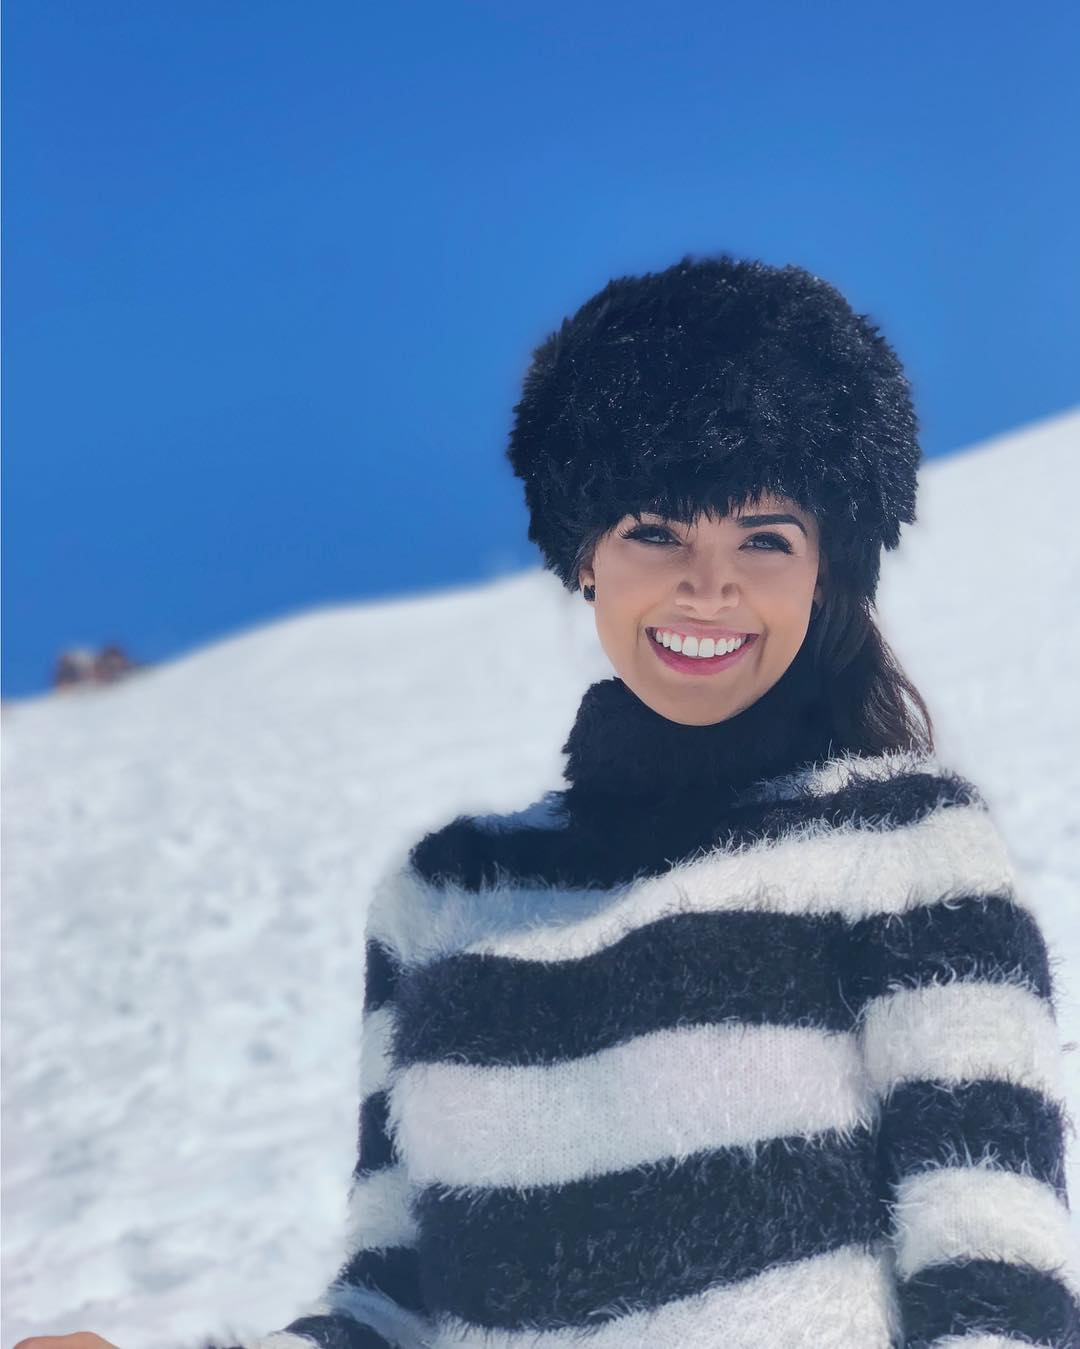 lucia arellano, top 6 de miss peru 2019.  - Página 2 45390311